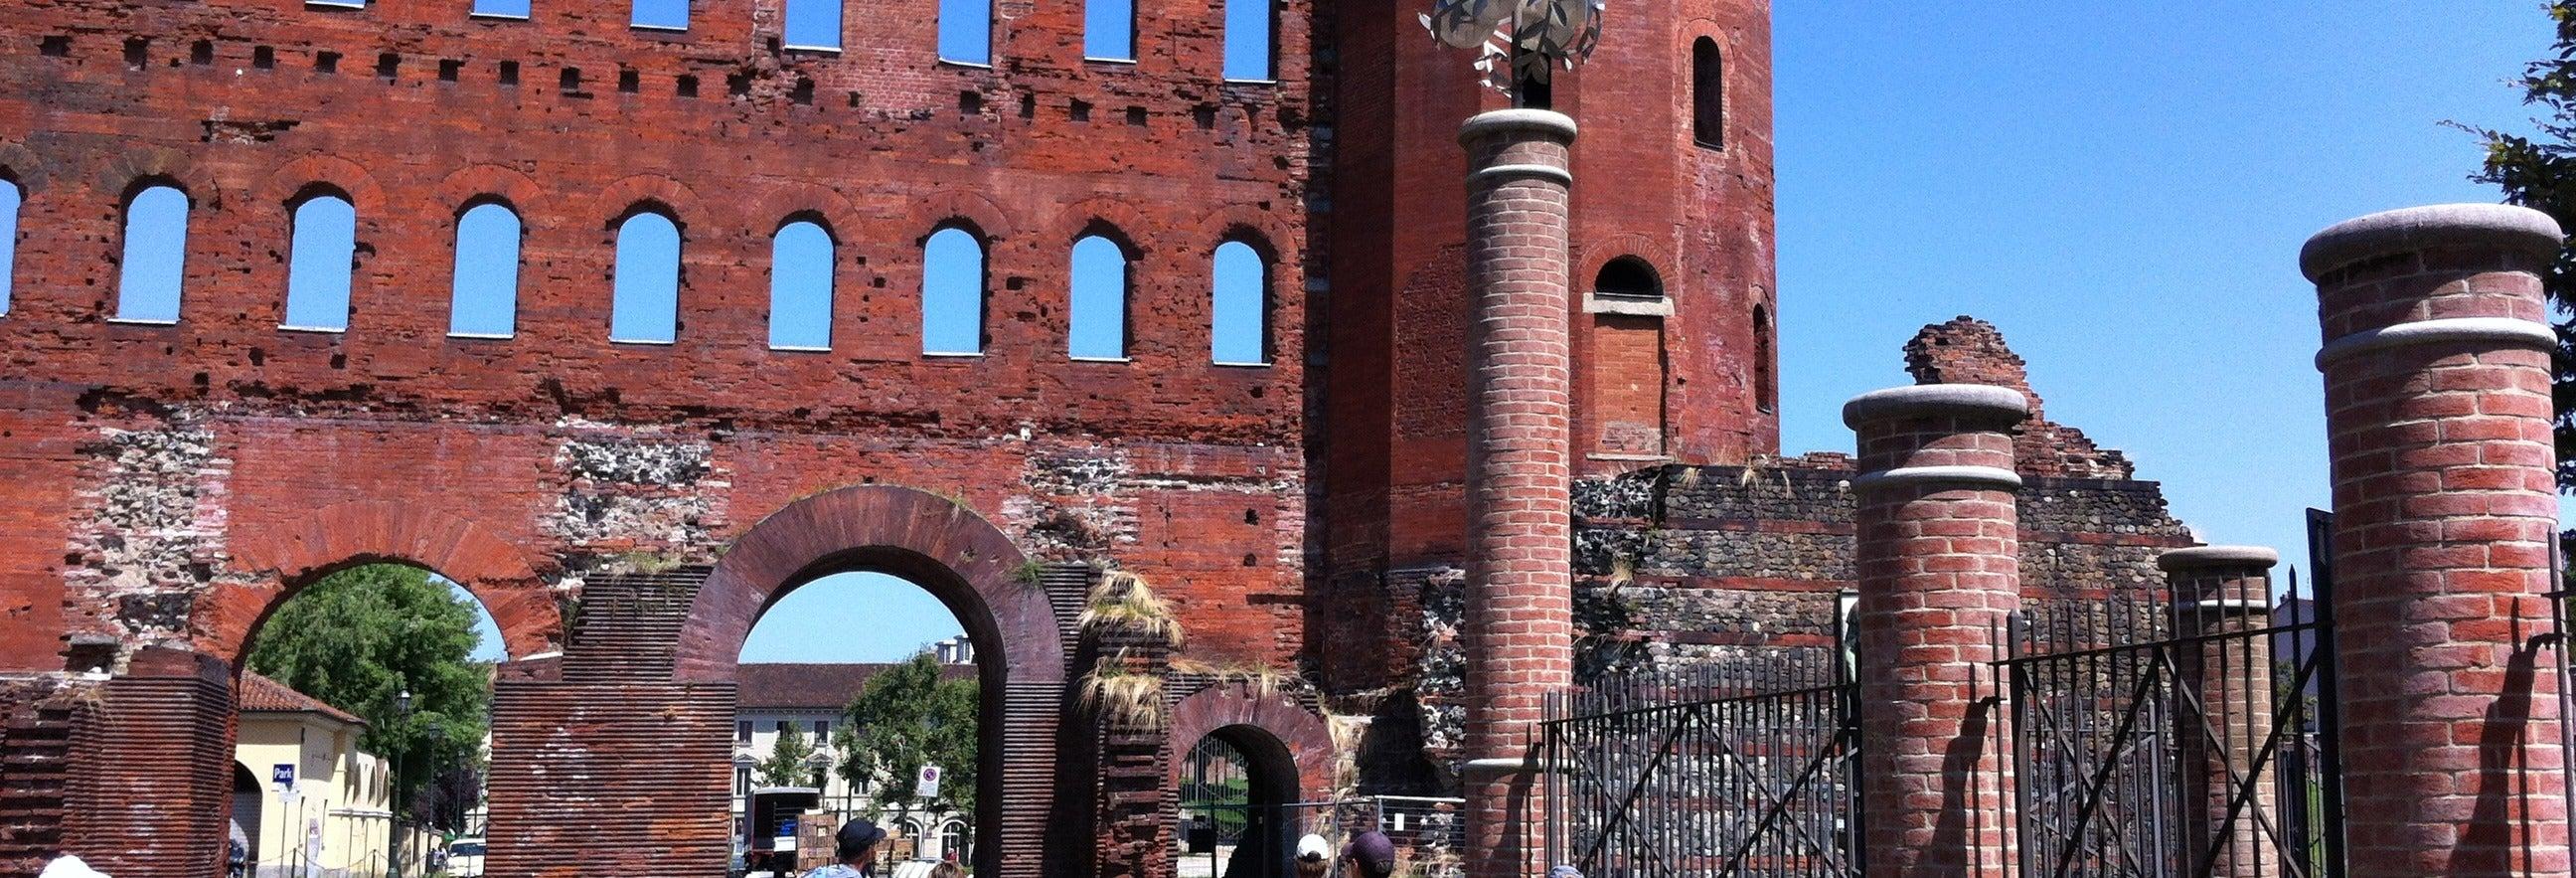 Tour di Torino in bicicletta